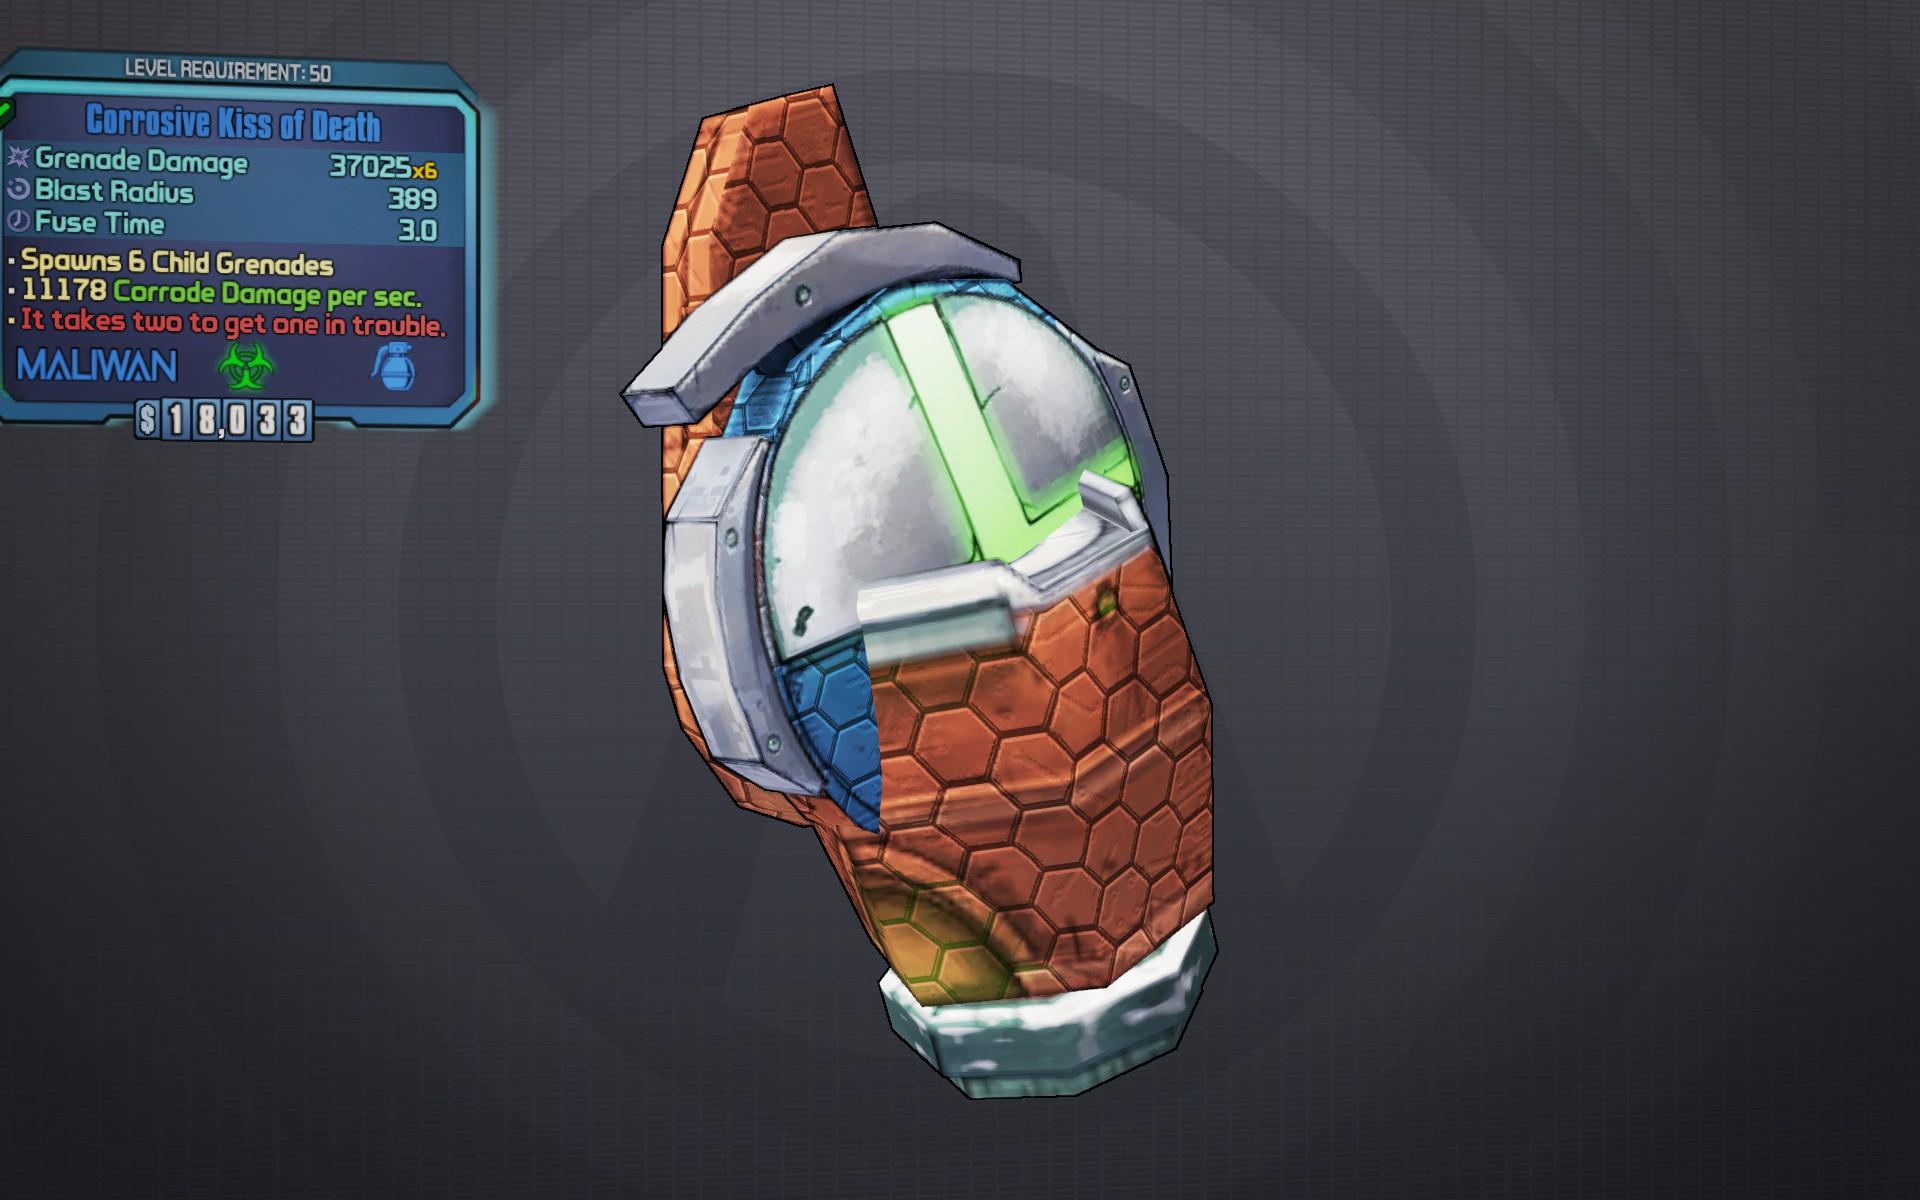 Grenade F-1: photo, specifications, damage radius 50